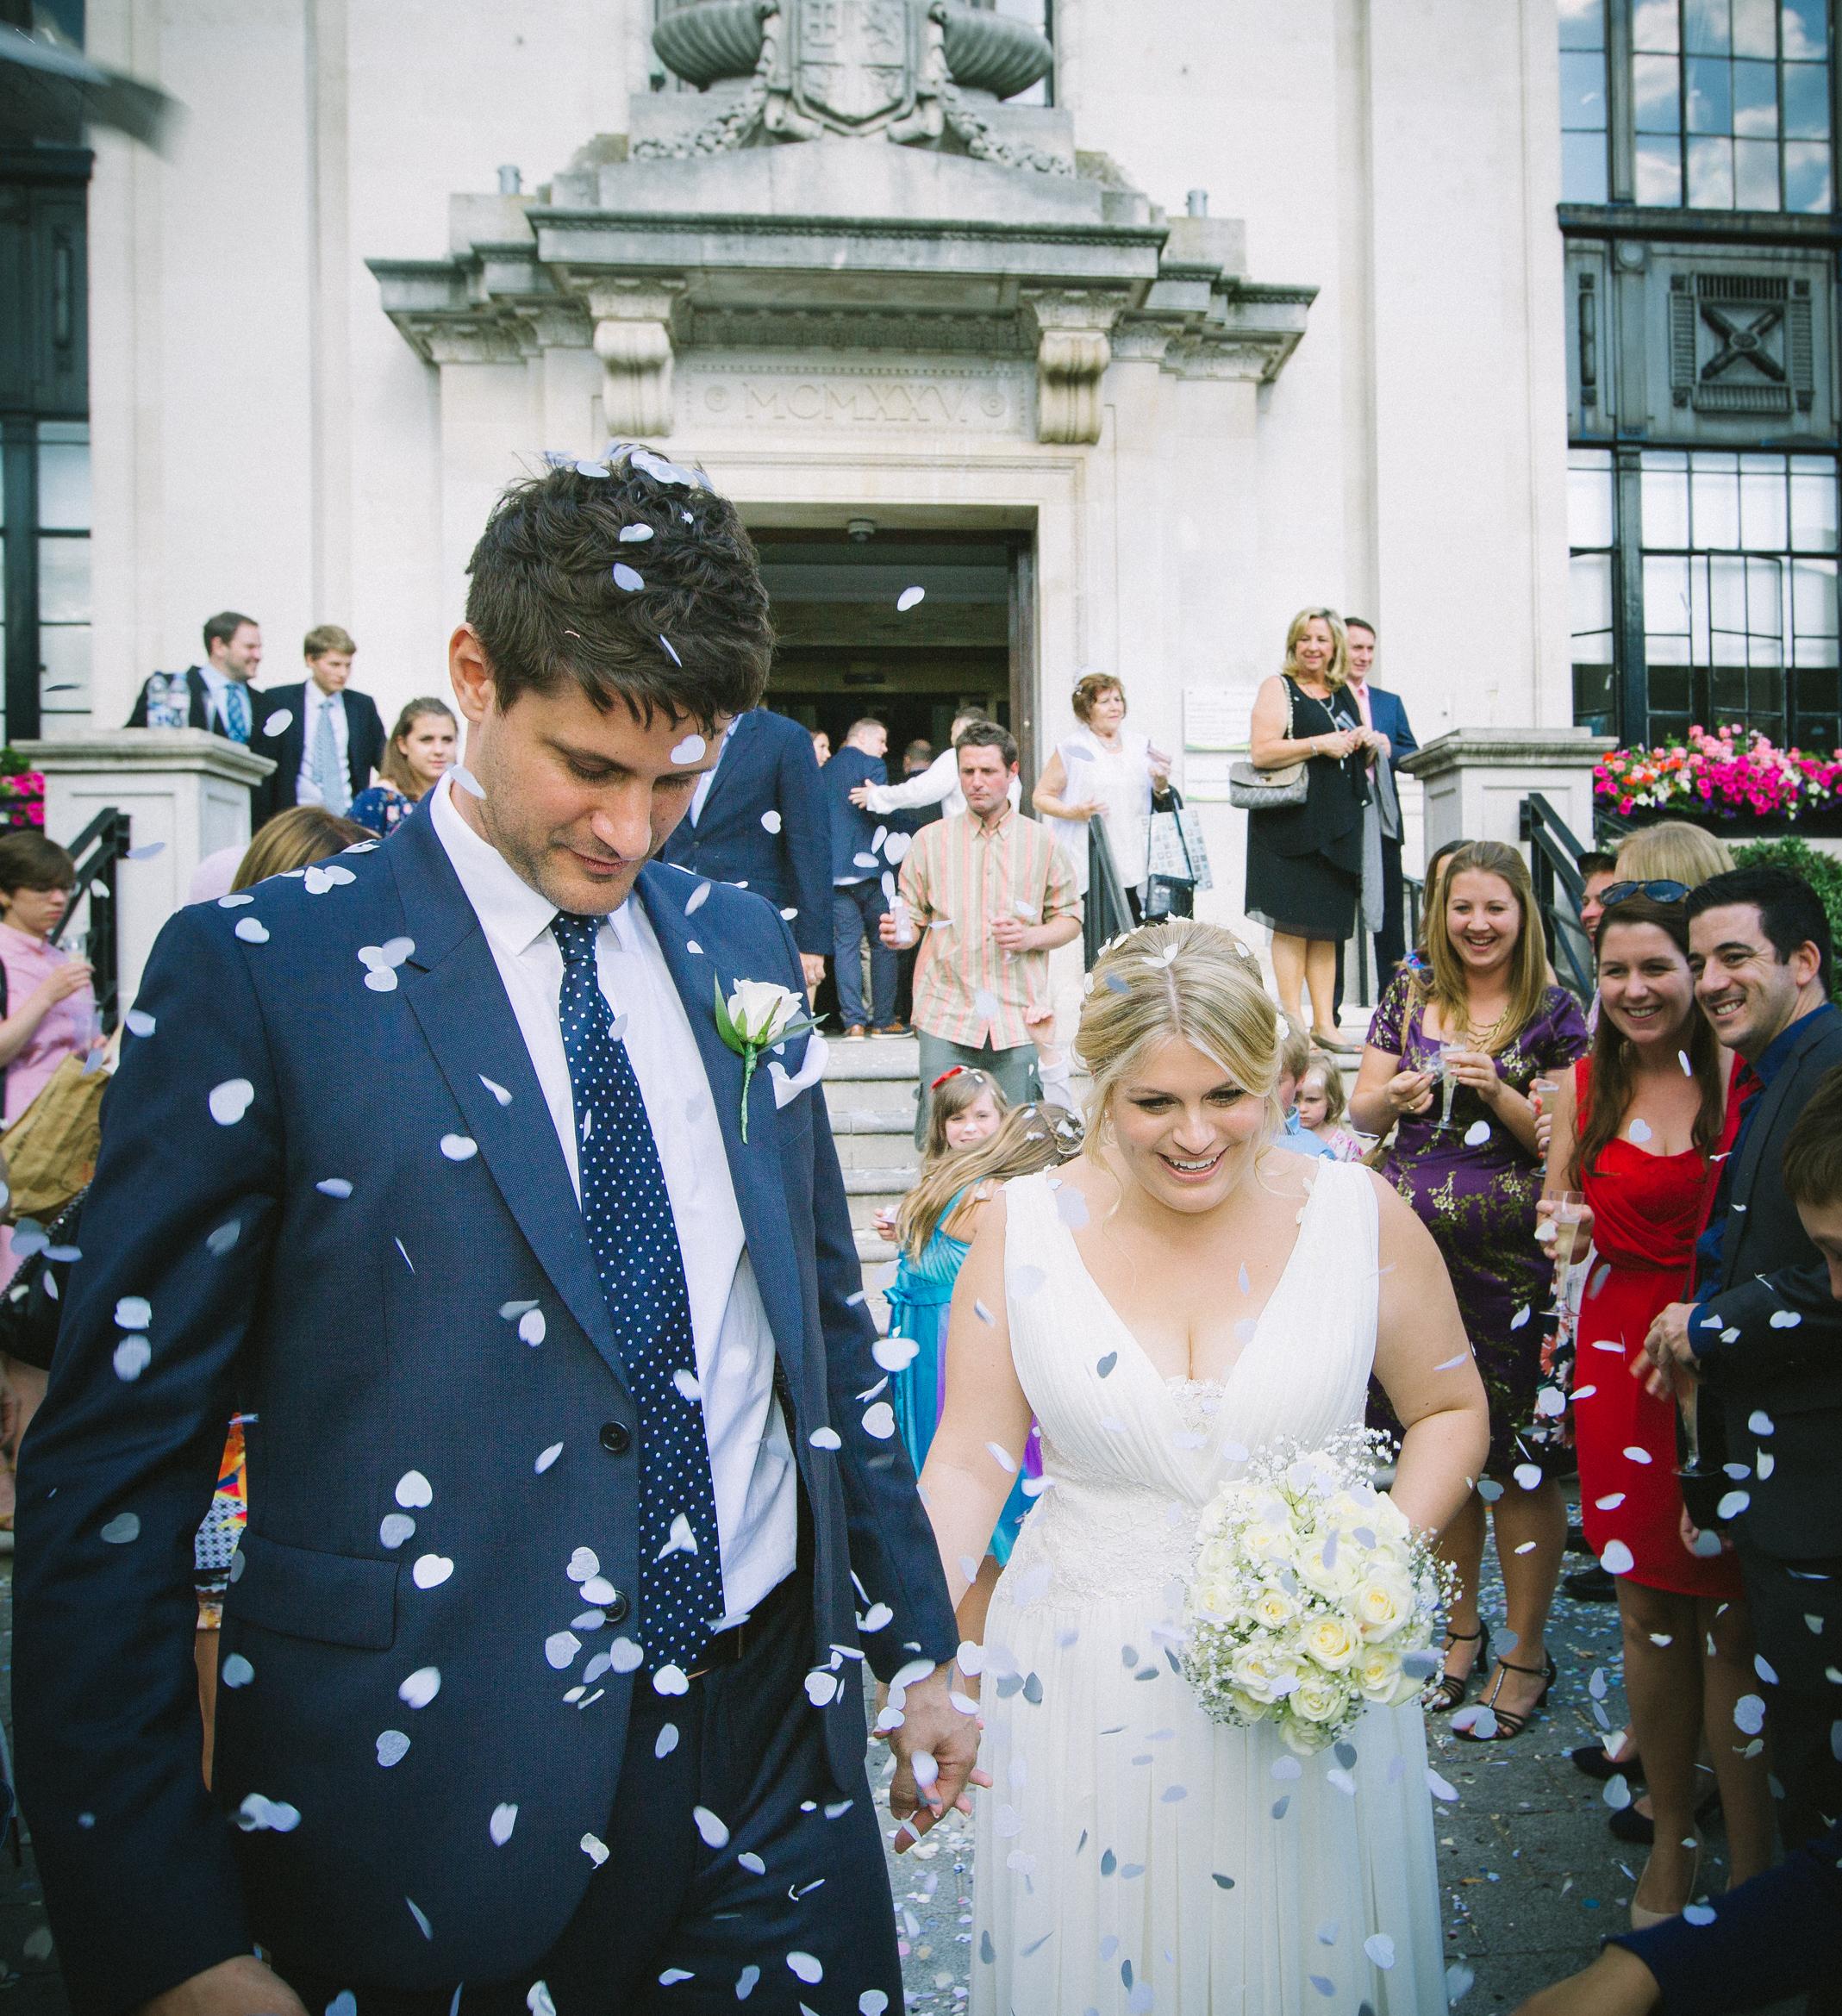 Islington-town-hall-confetti-bride-groom-1